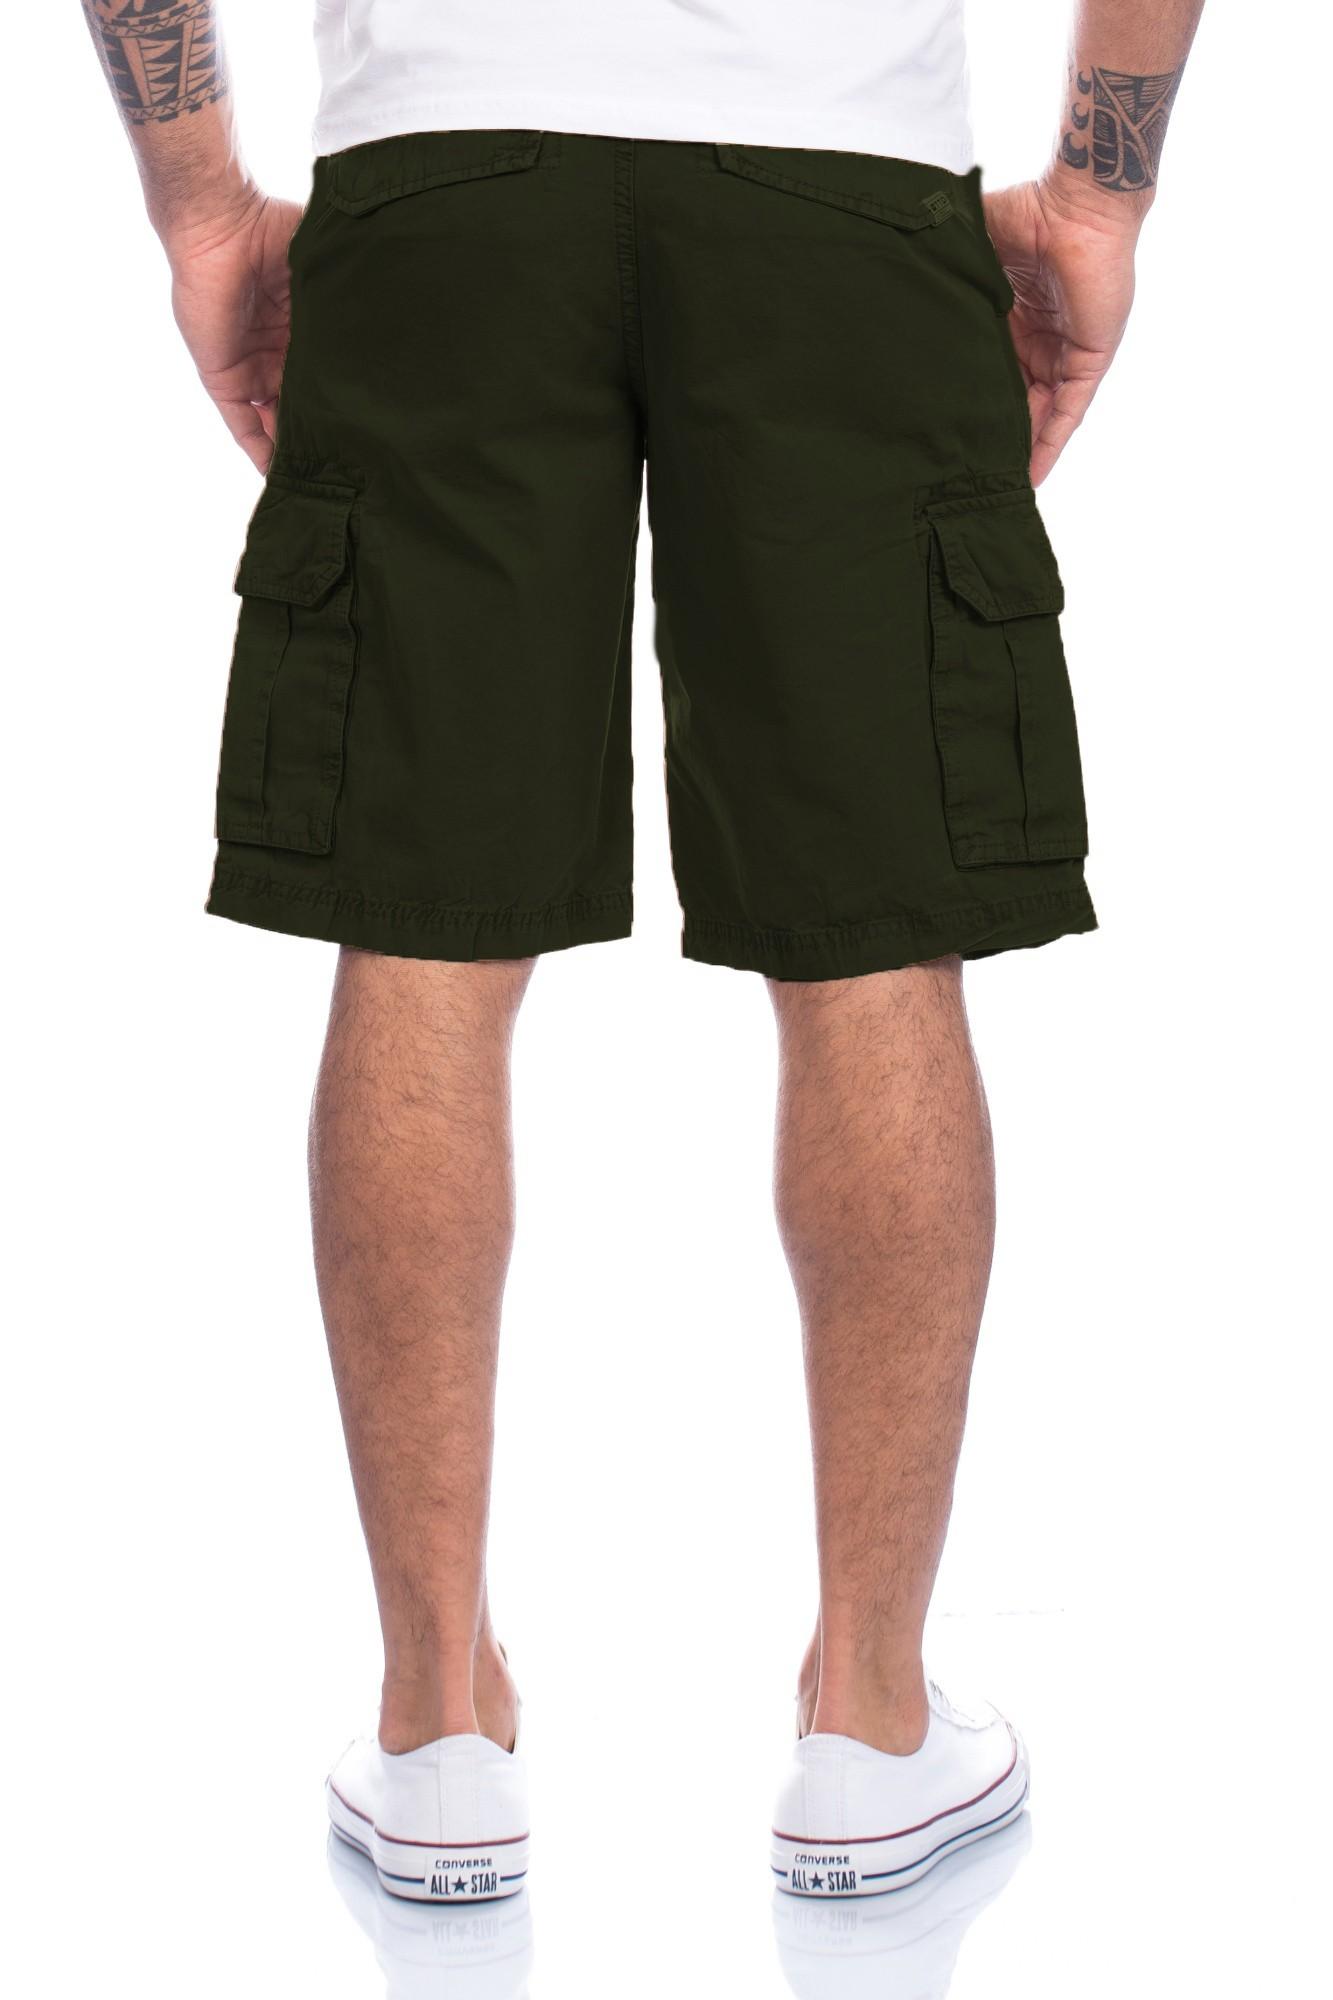 TOM TAILOR HERREN kurze Hose Cargo Shorts Bermuda Sommer